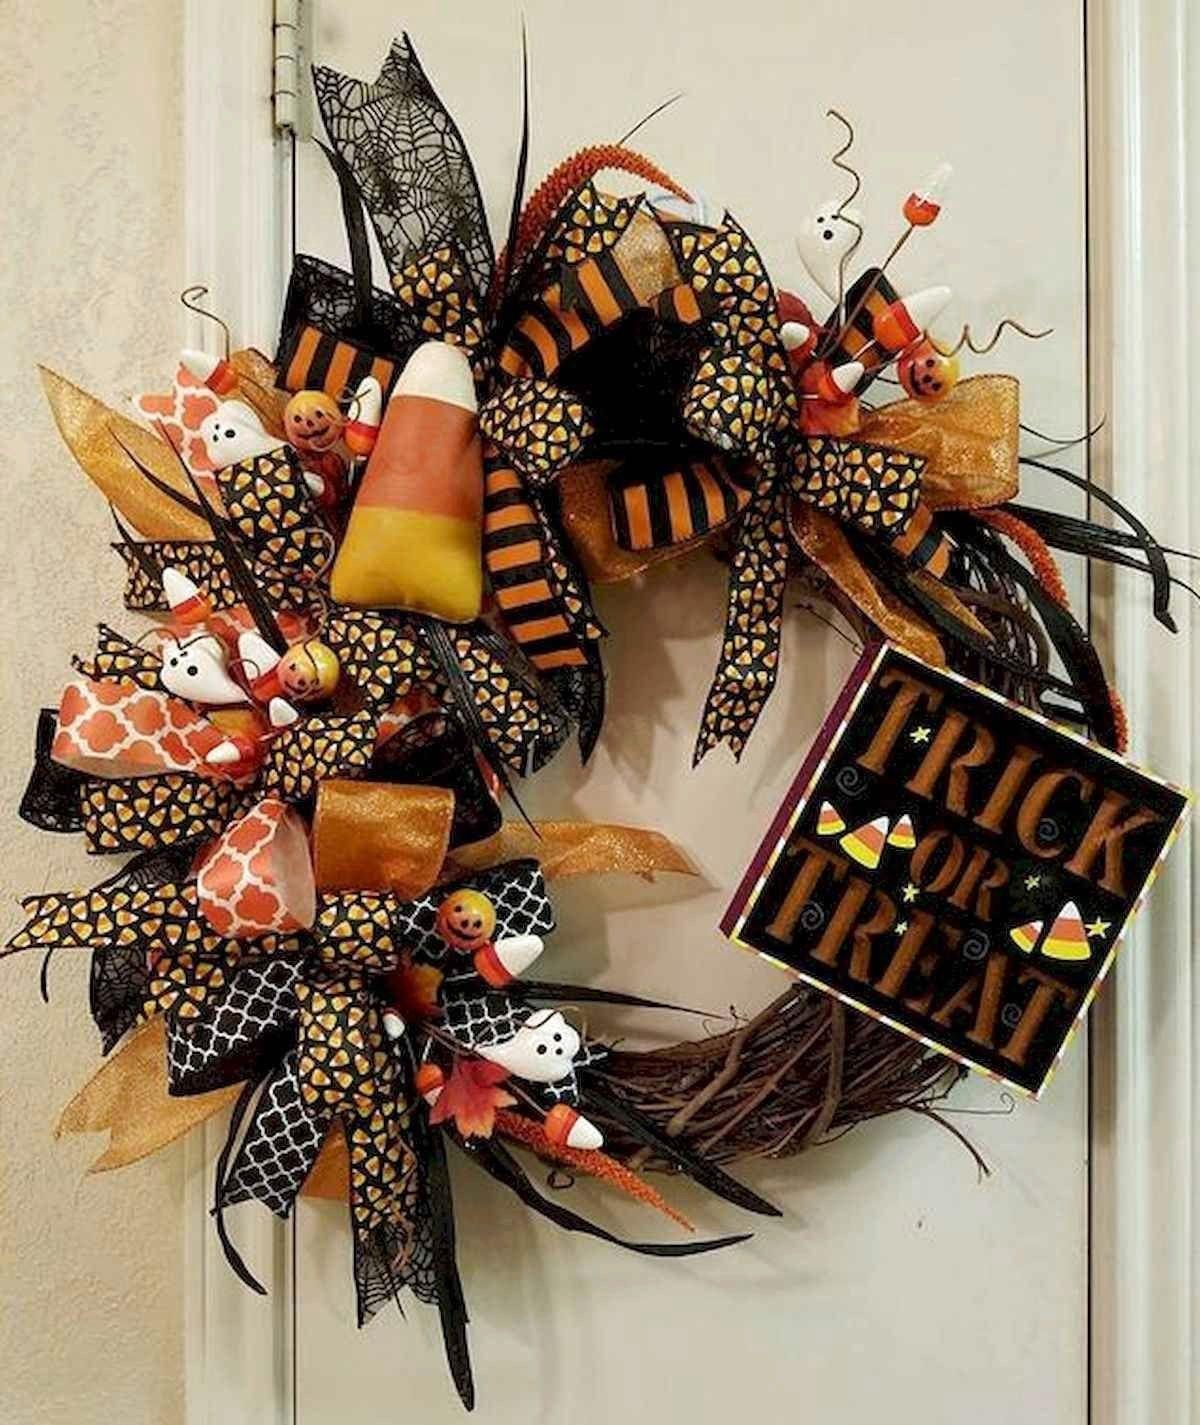 70 Favourite Diy Halloween Decorations Ideas (32